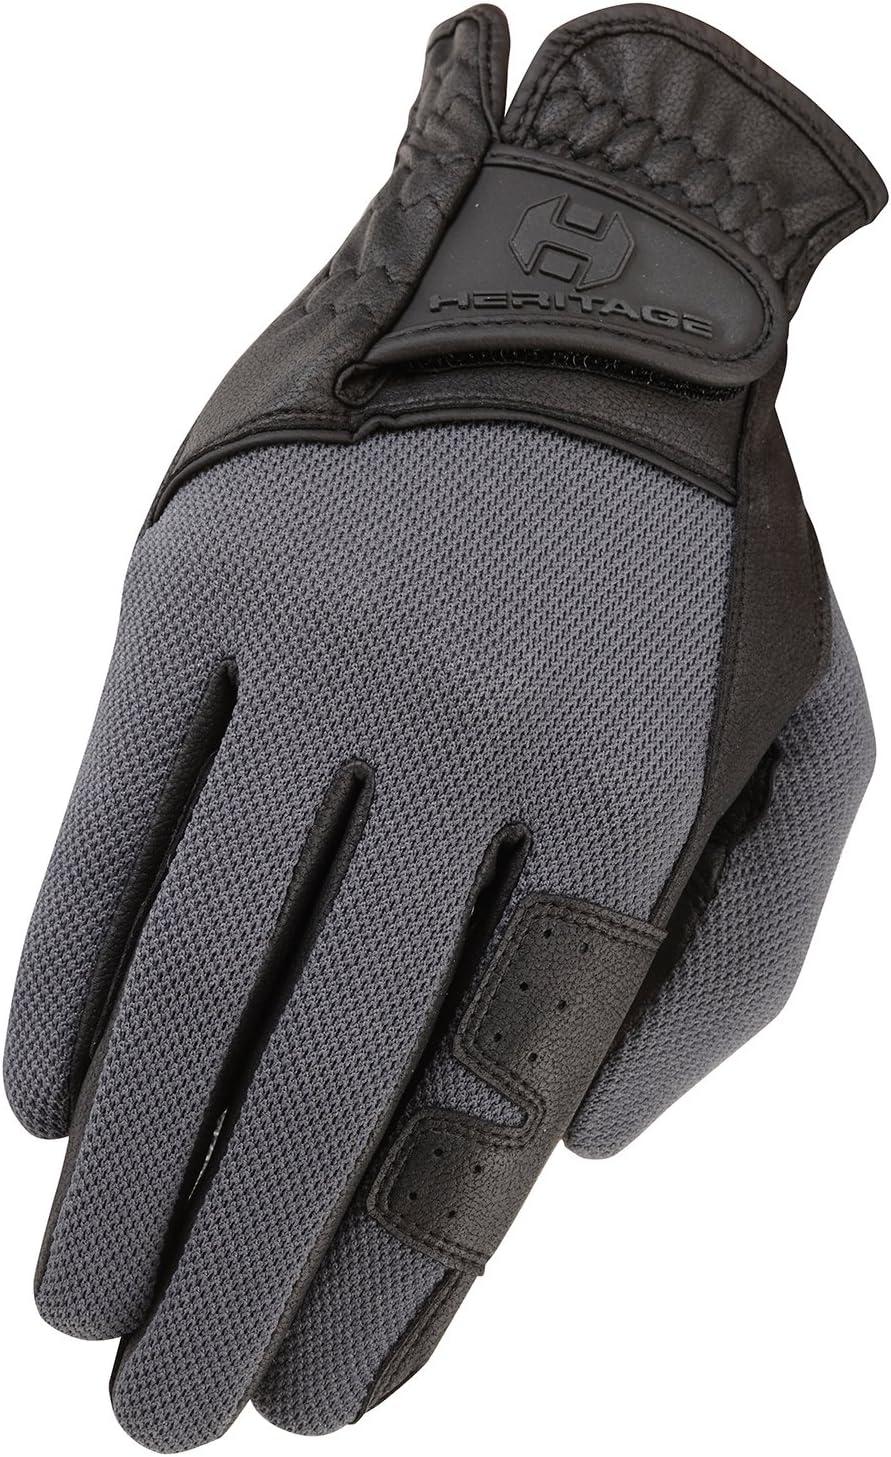 Heritage X-Country Glove Black//Gray 11